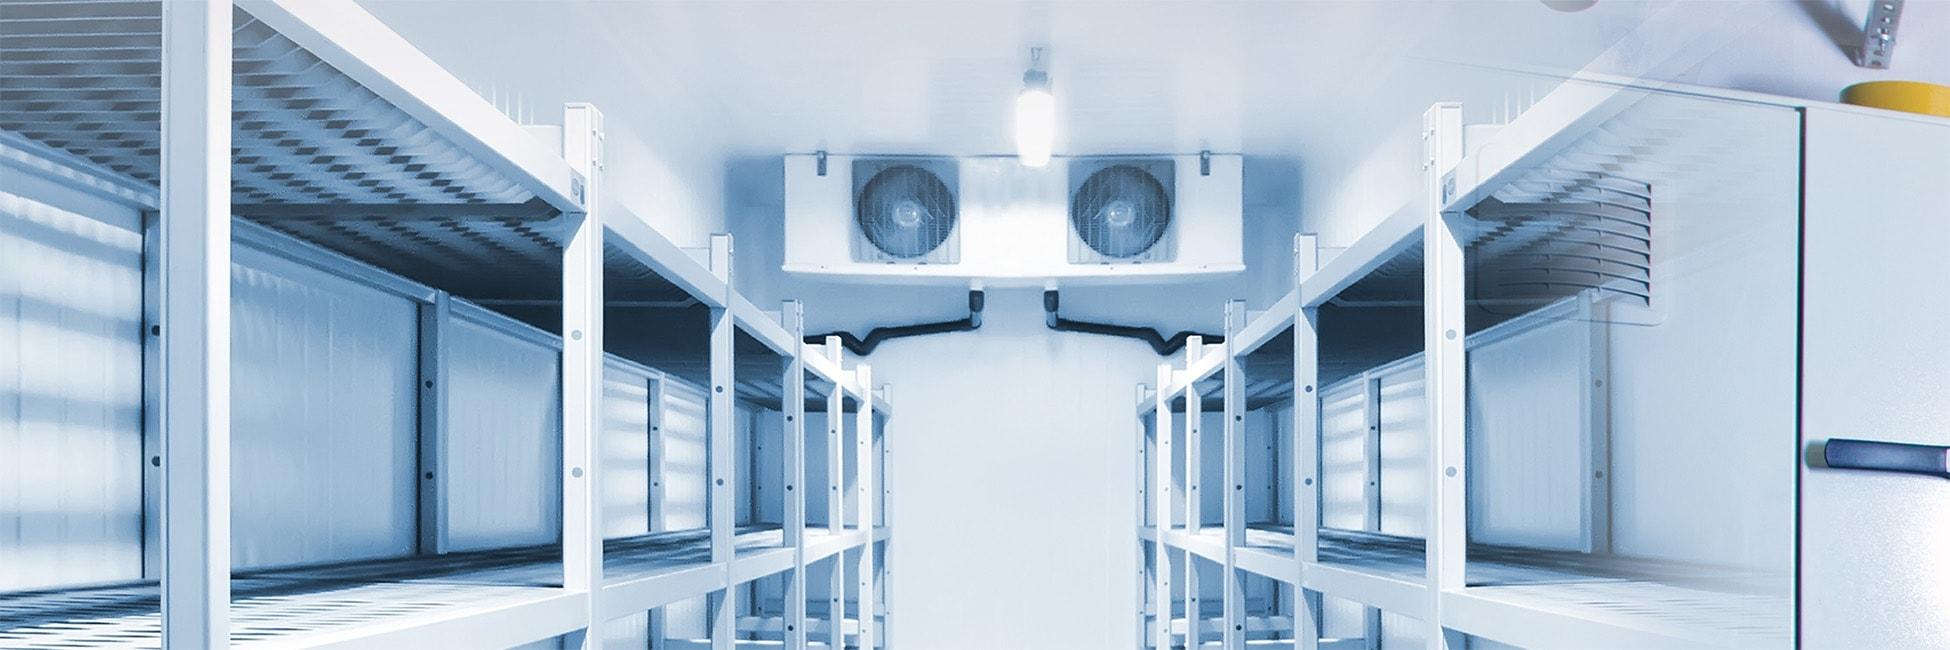 wcd masthead walk in refrigerators